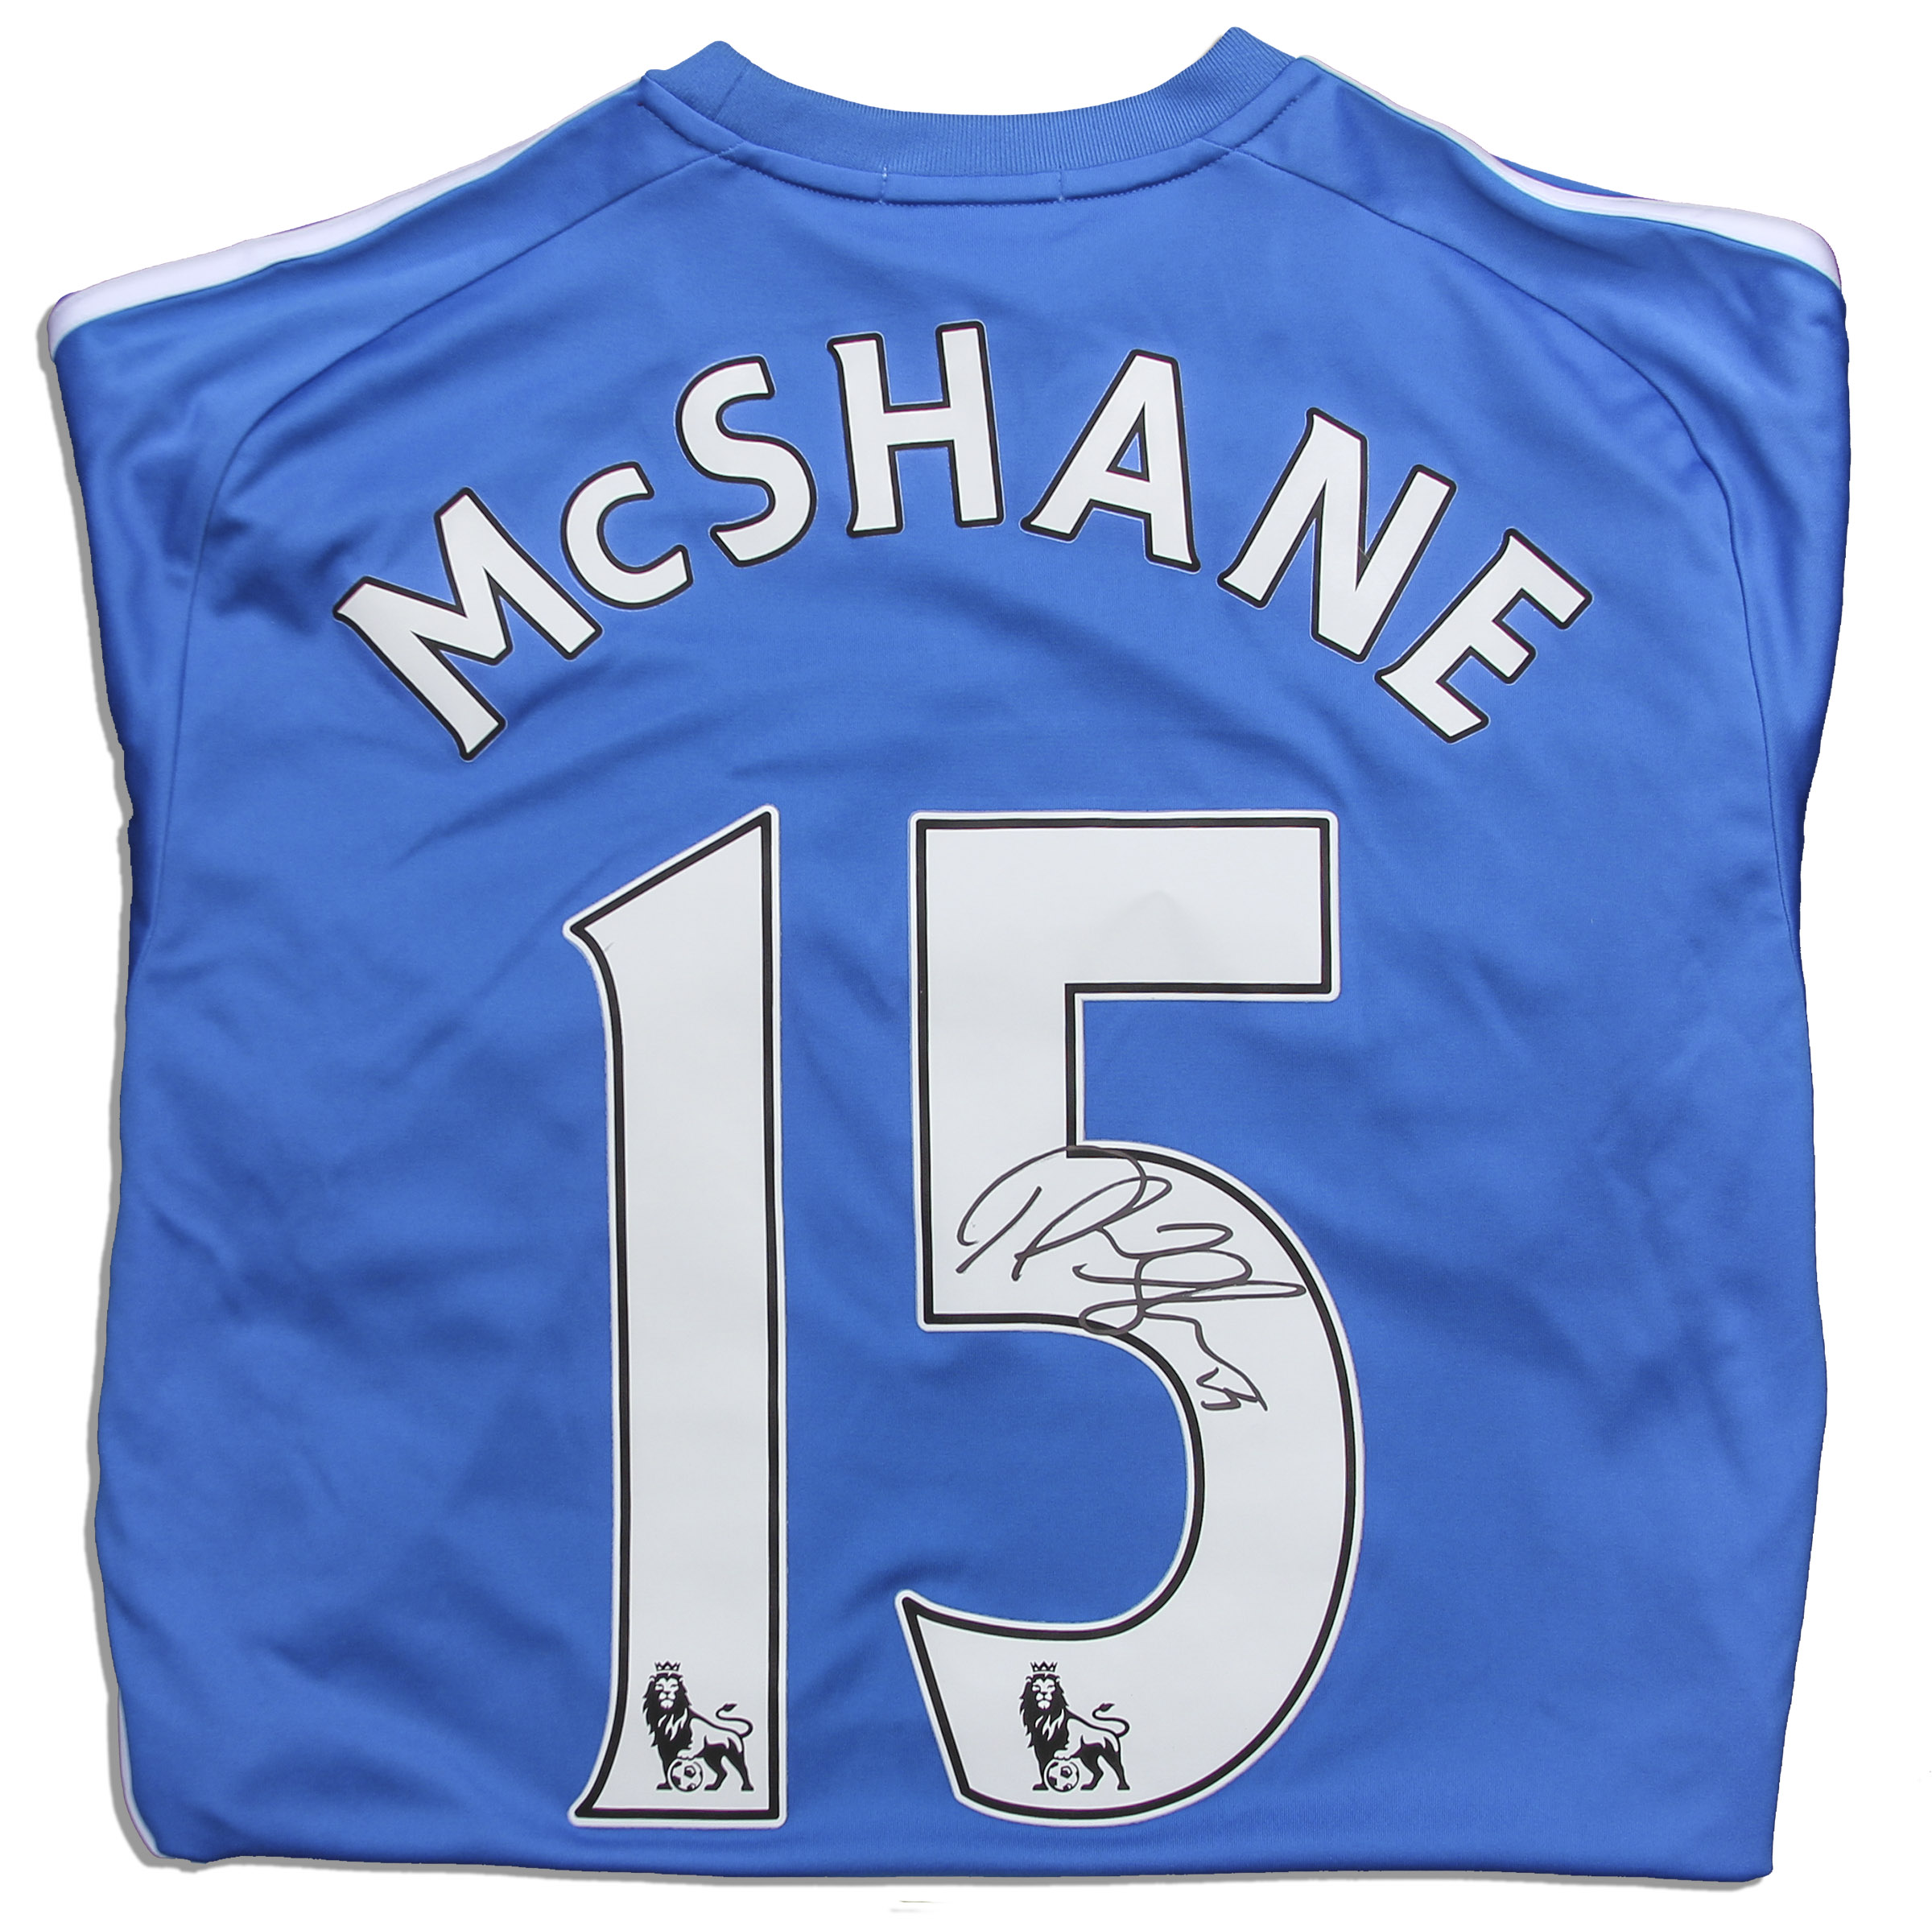 Lot Detail - Paul McShane Match Worn Hull City Football Shirt Signed 0e1ab162c